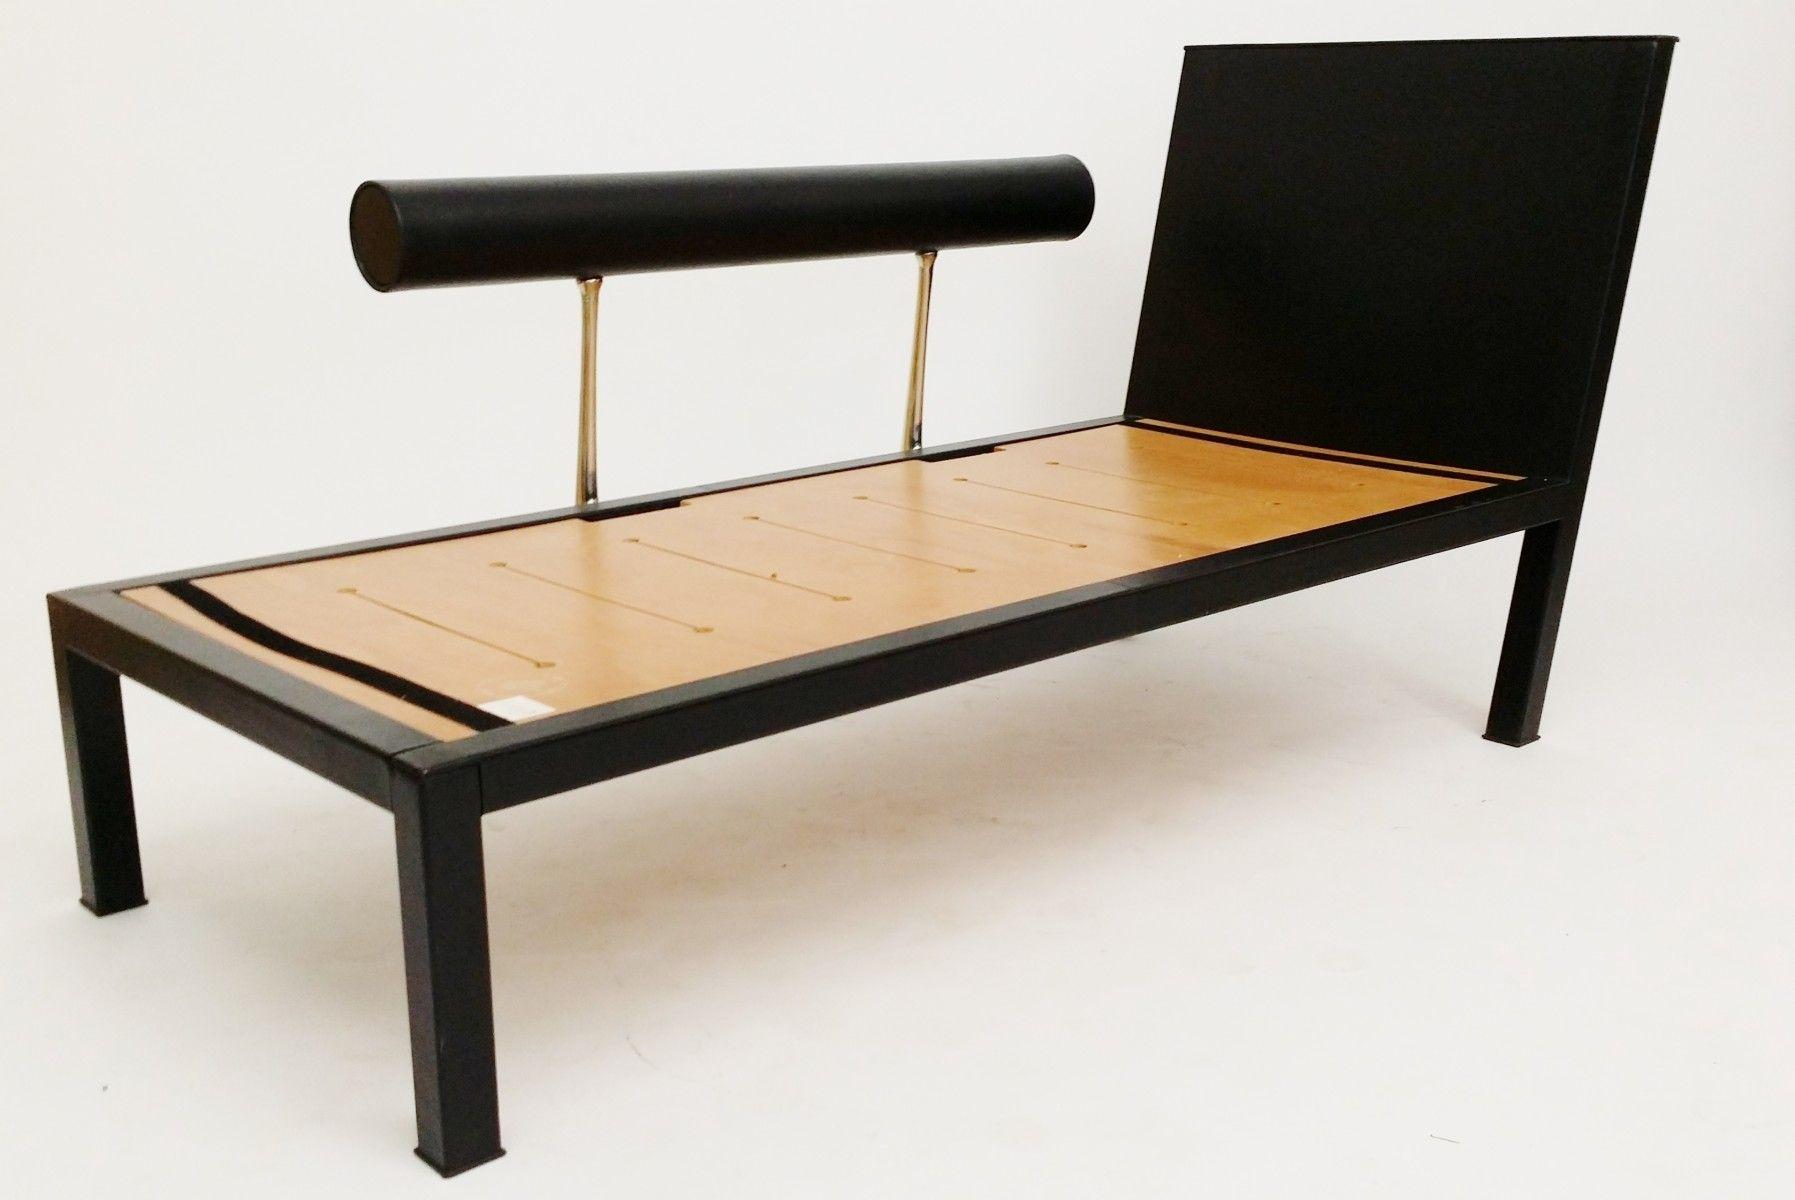 2b437b1084edce066e04281a665dc3bc Incroyable De Table Basse Le Corbusier Concept